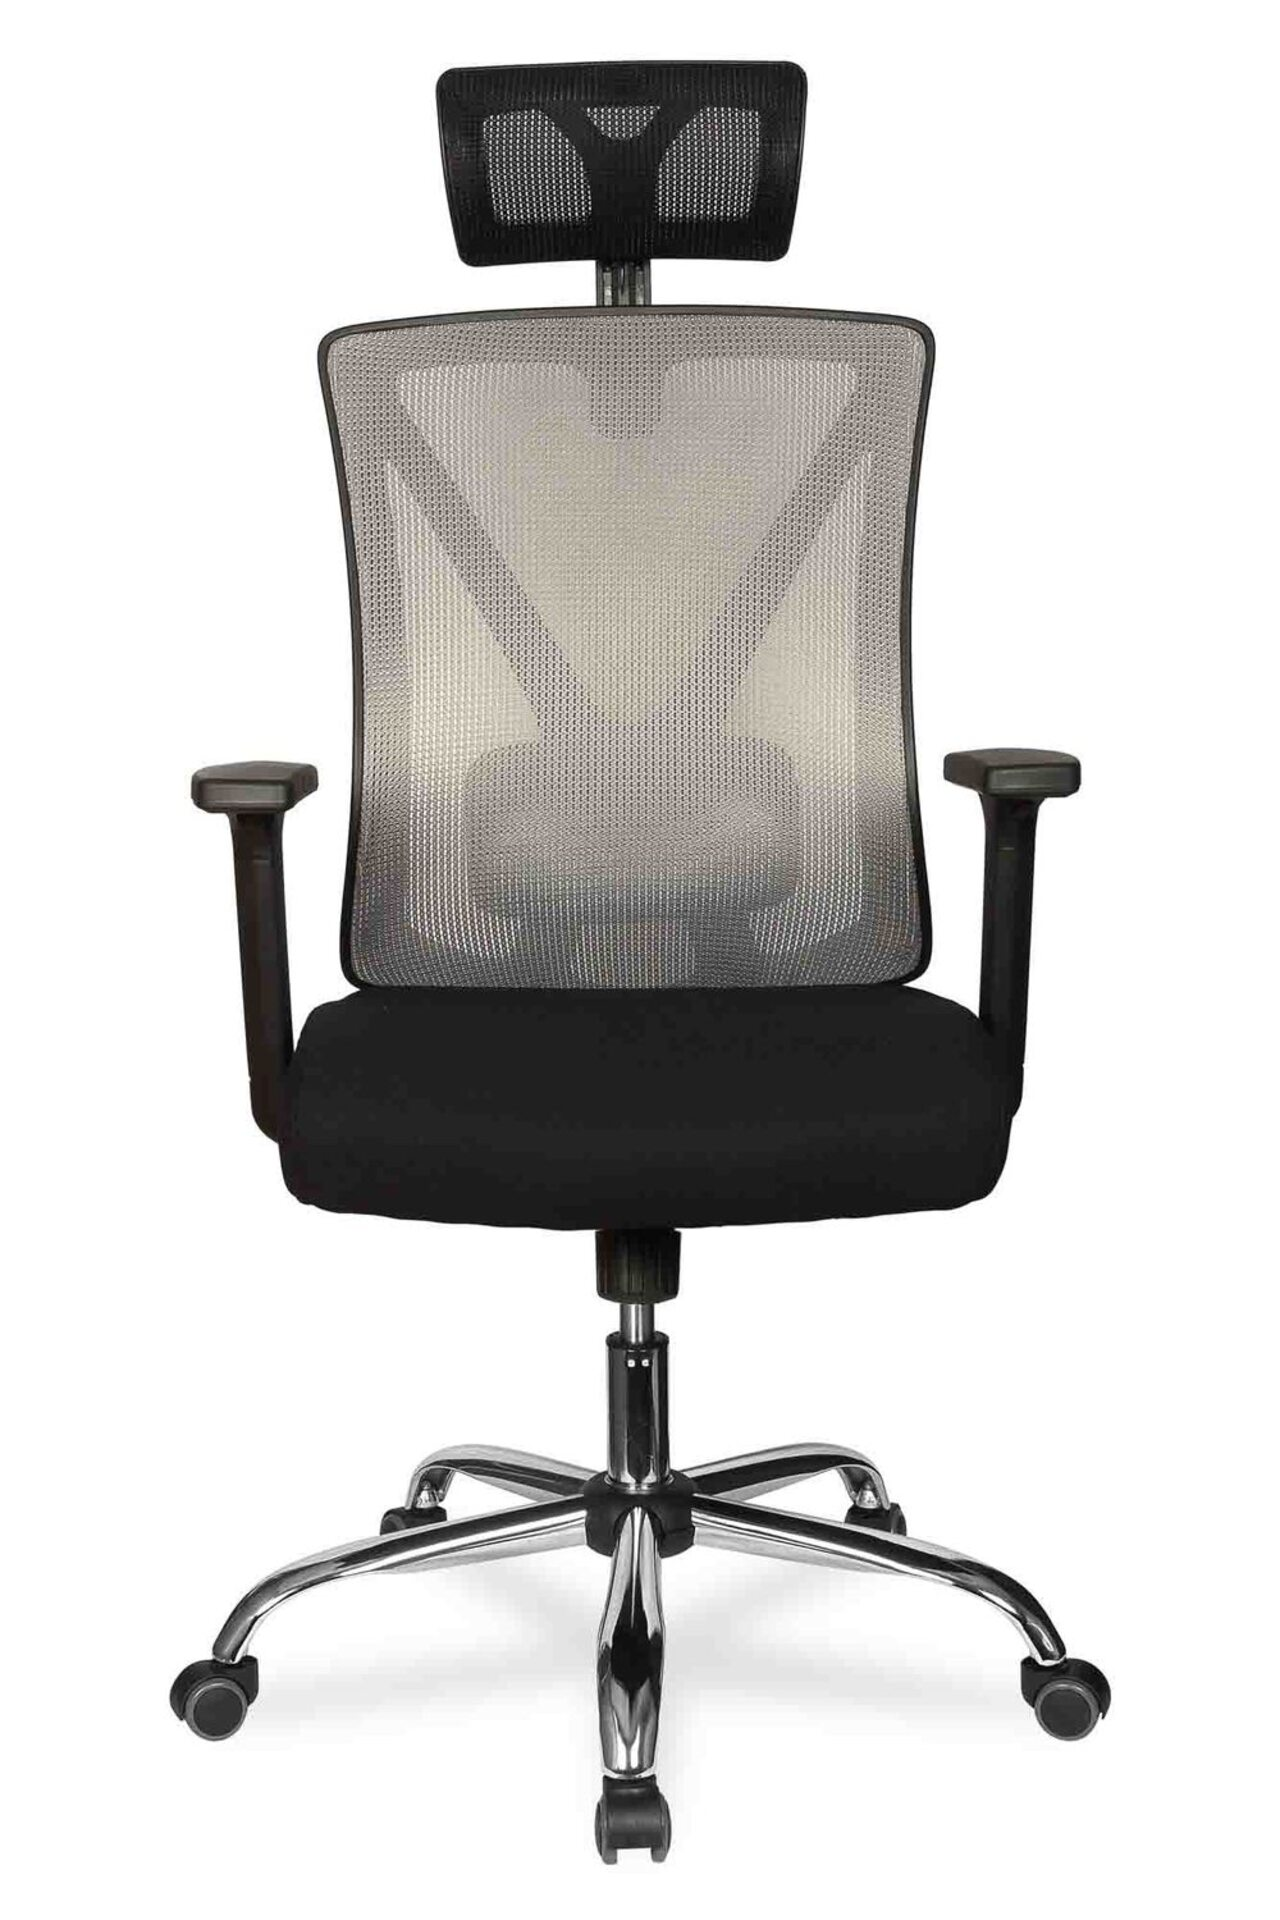 Кресло руководителя College CLG-424 MXH-A - фото 6